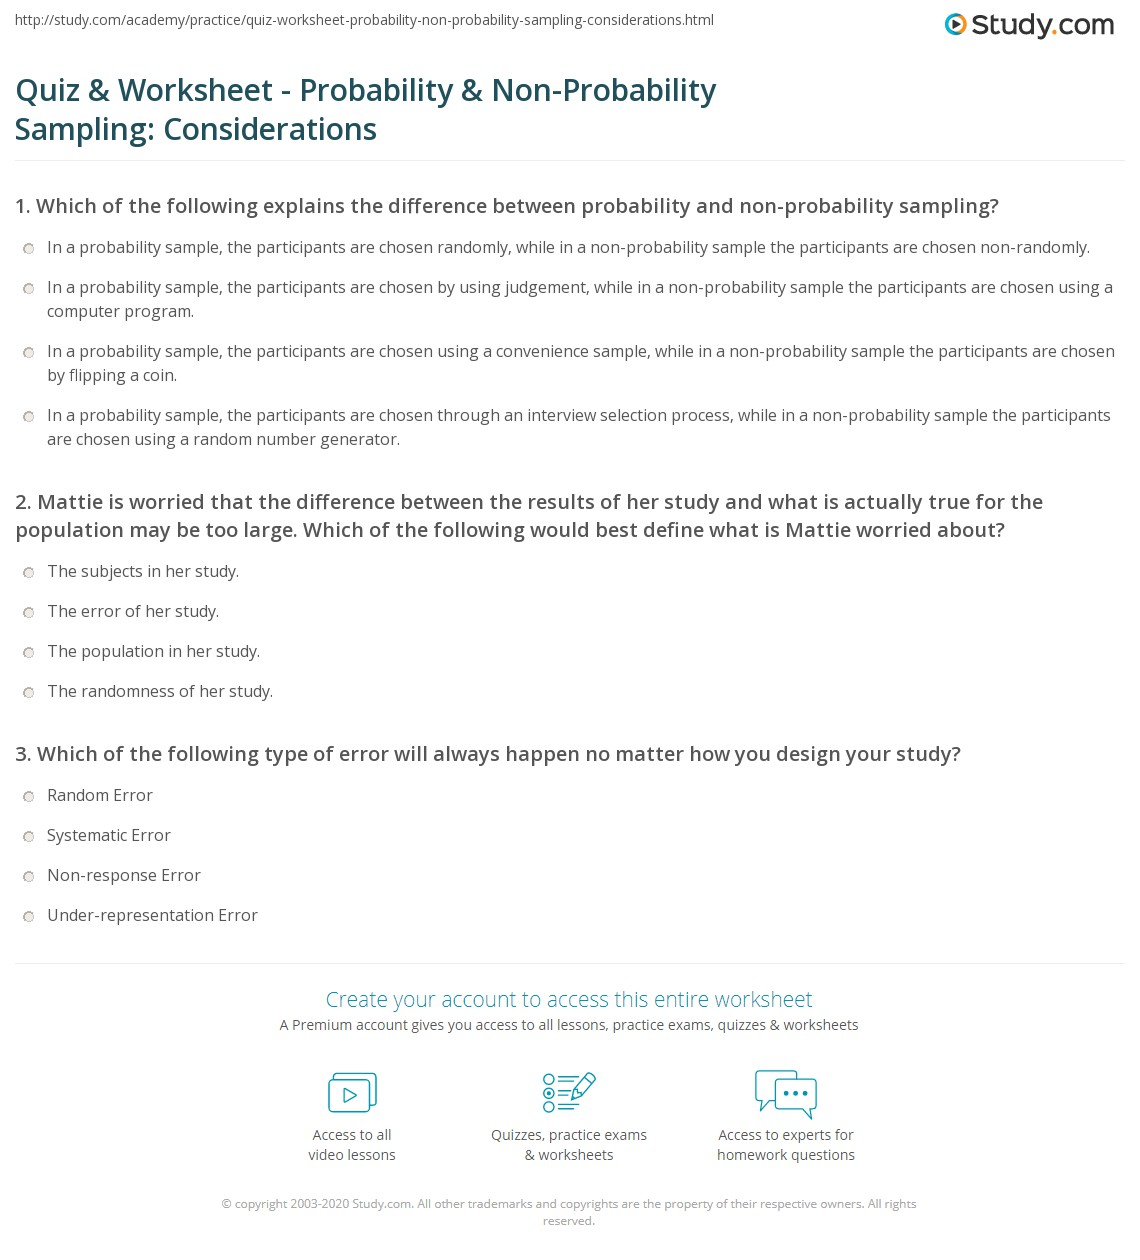 Quiz & Worksheet - Probability & Non-Probability Sampling ...